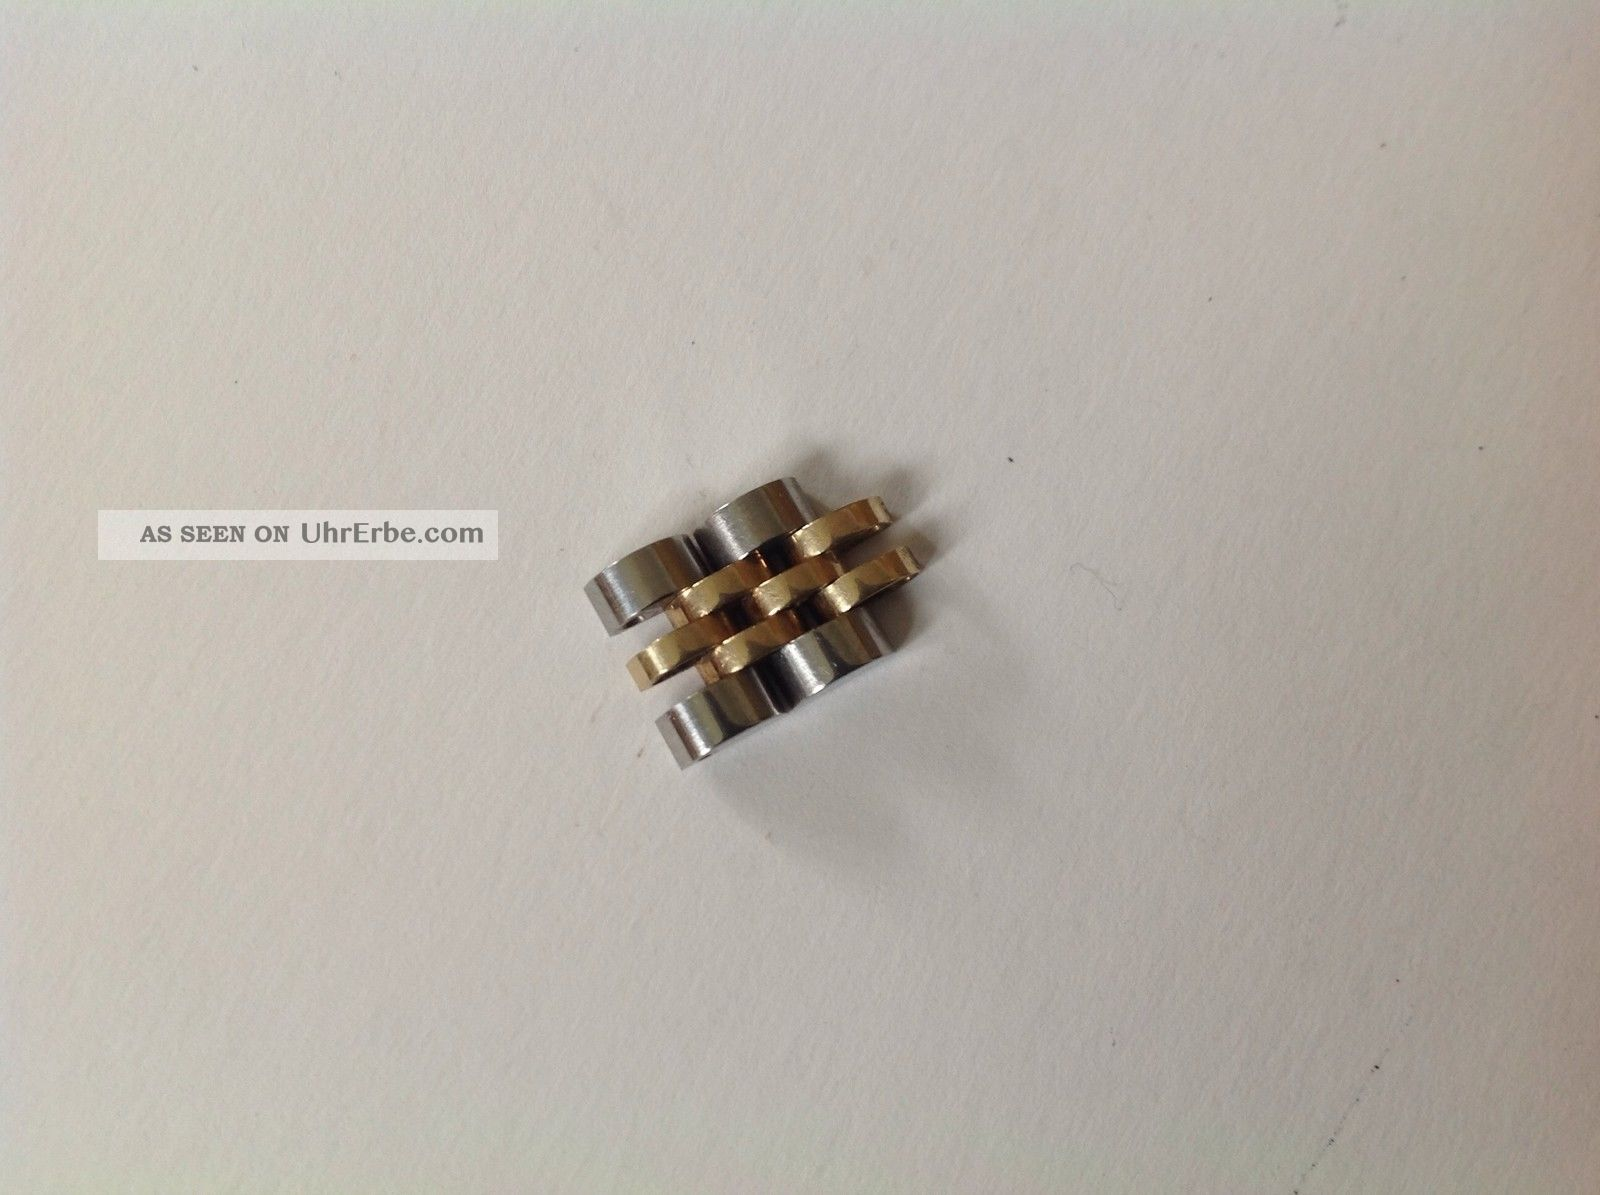 2 X Damen Rolex Ersatzglied Stahl/gold Armbanduhren Bild